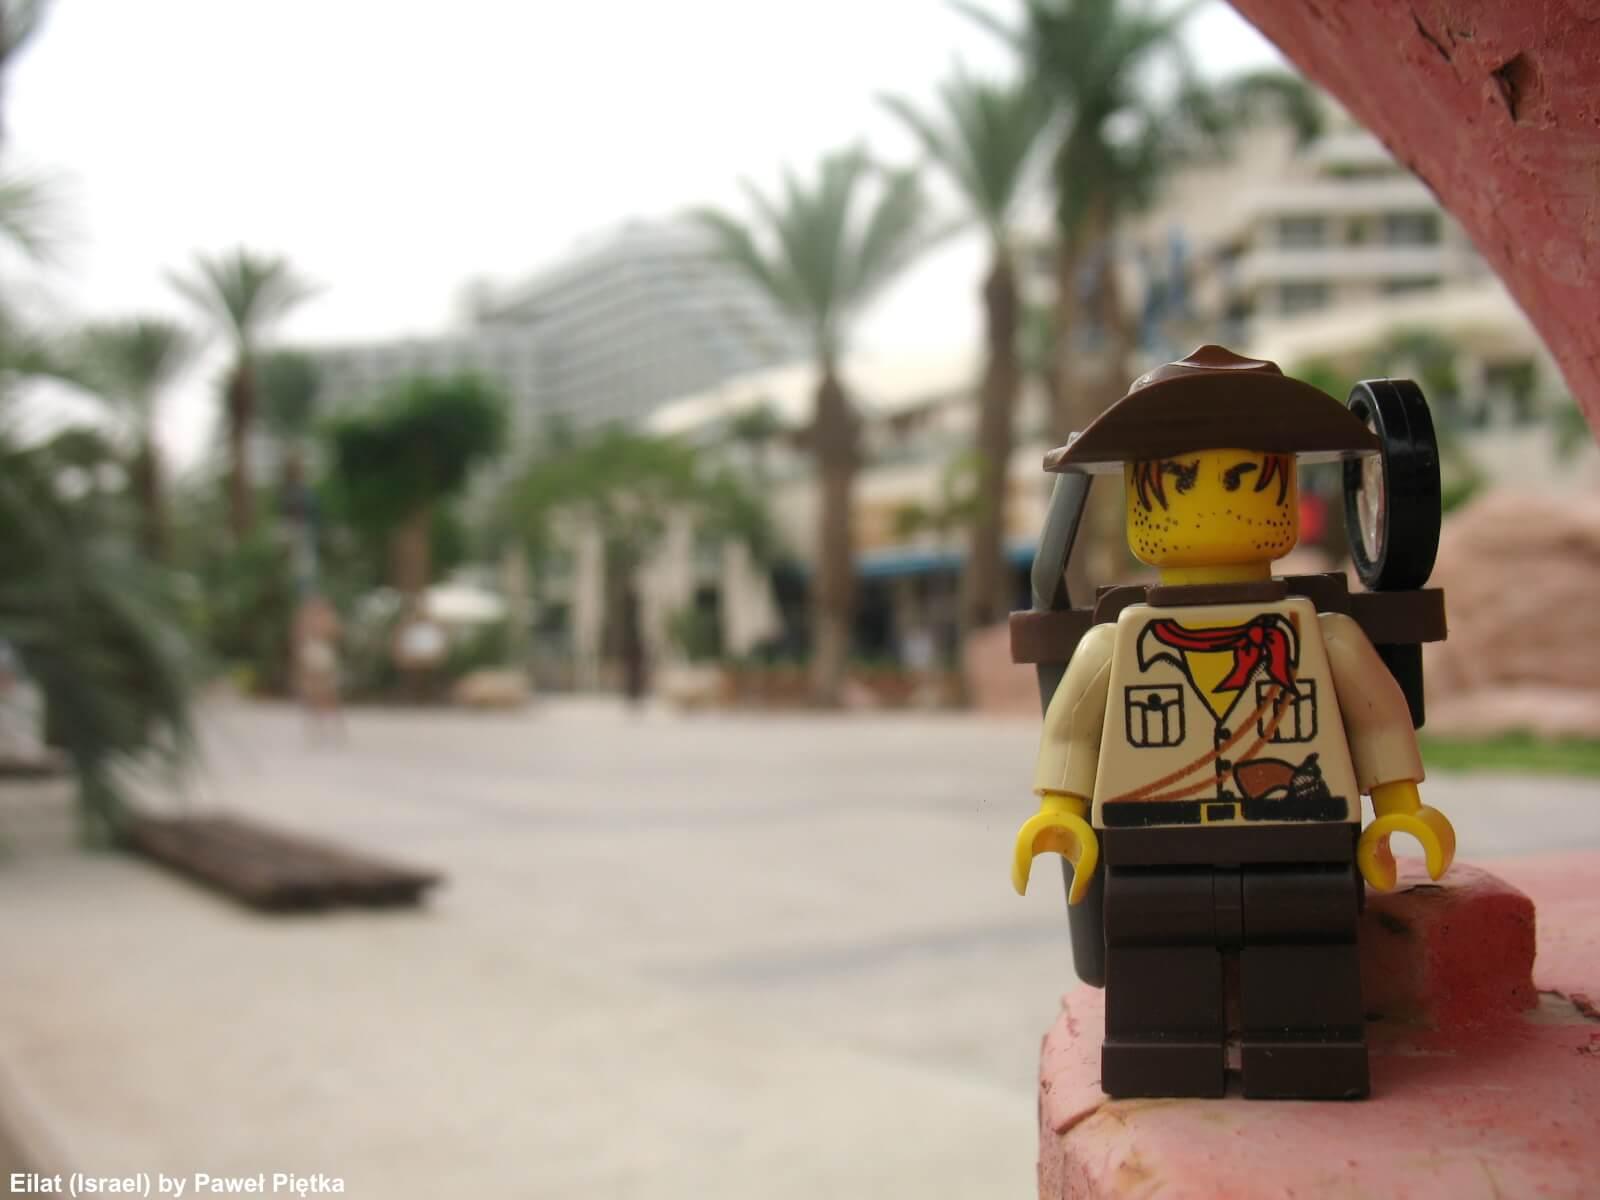 Eilat (Israel) - Promenande